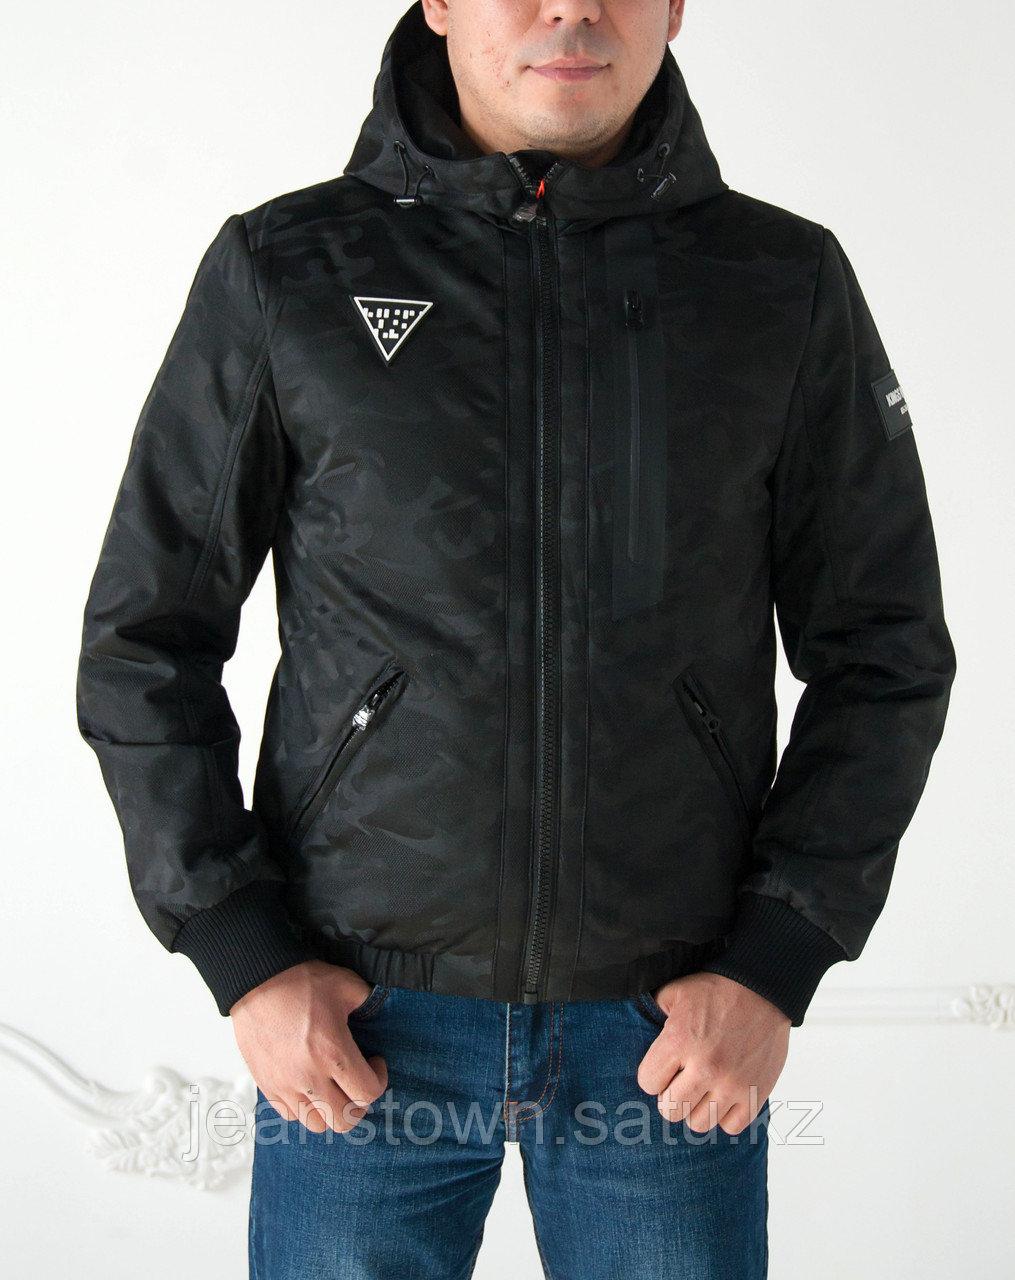 Куртка мужская демисезонная Kings  Wind короткая, черная